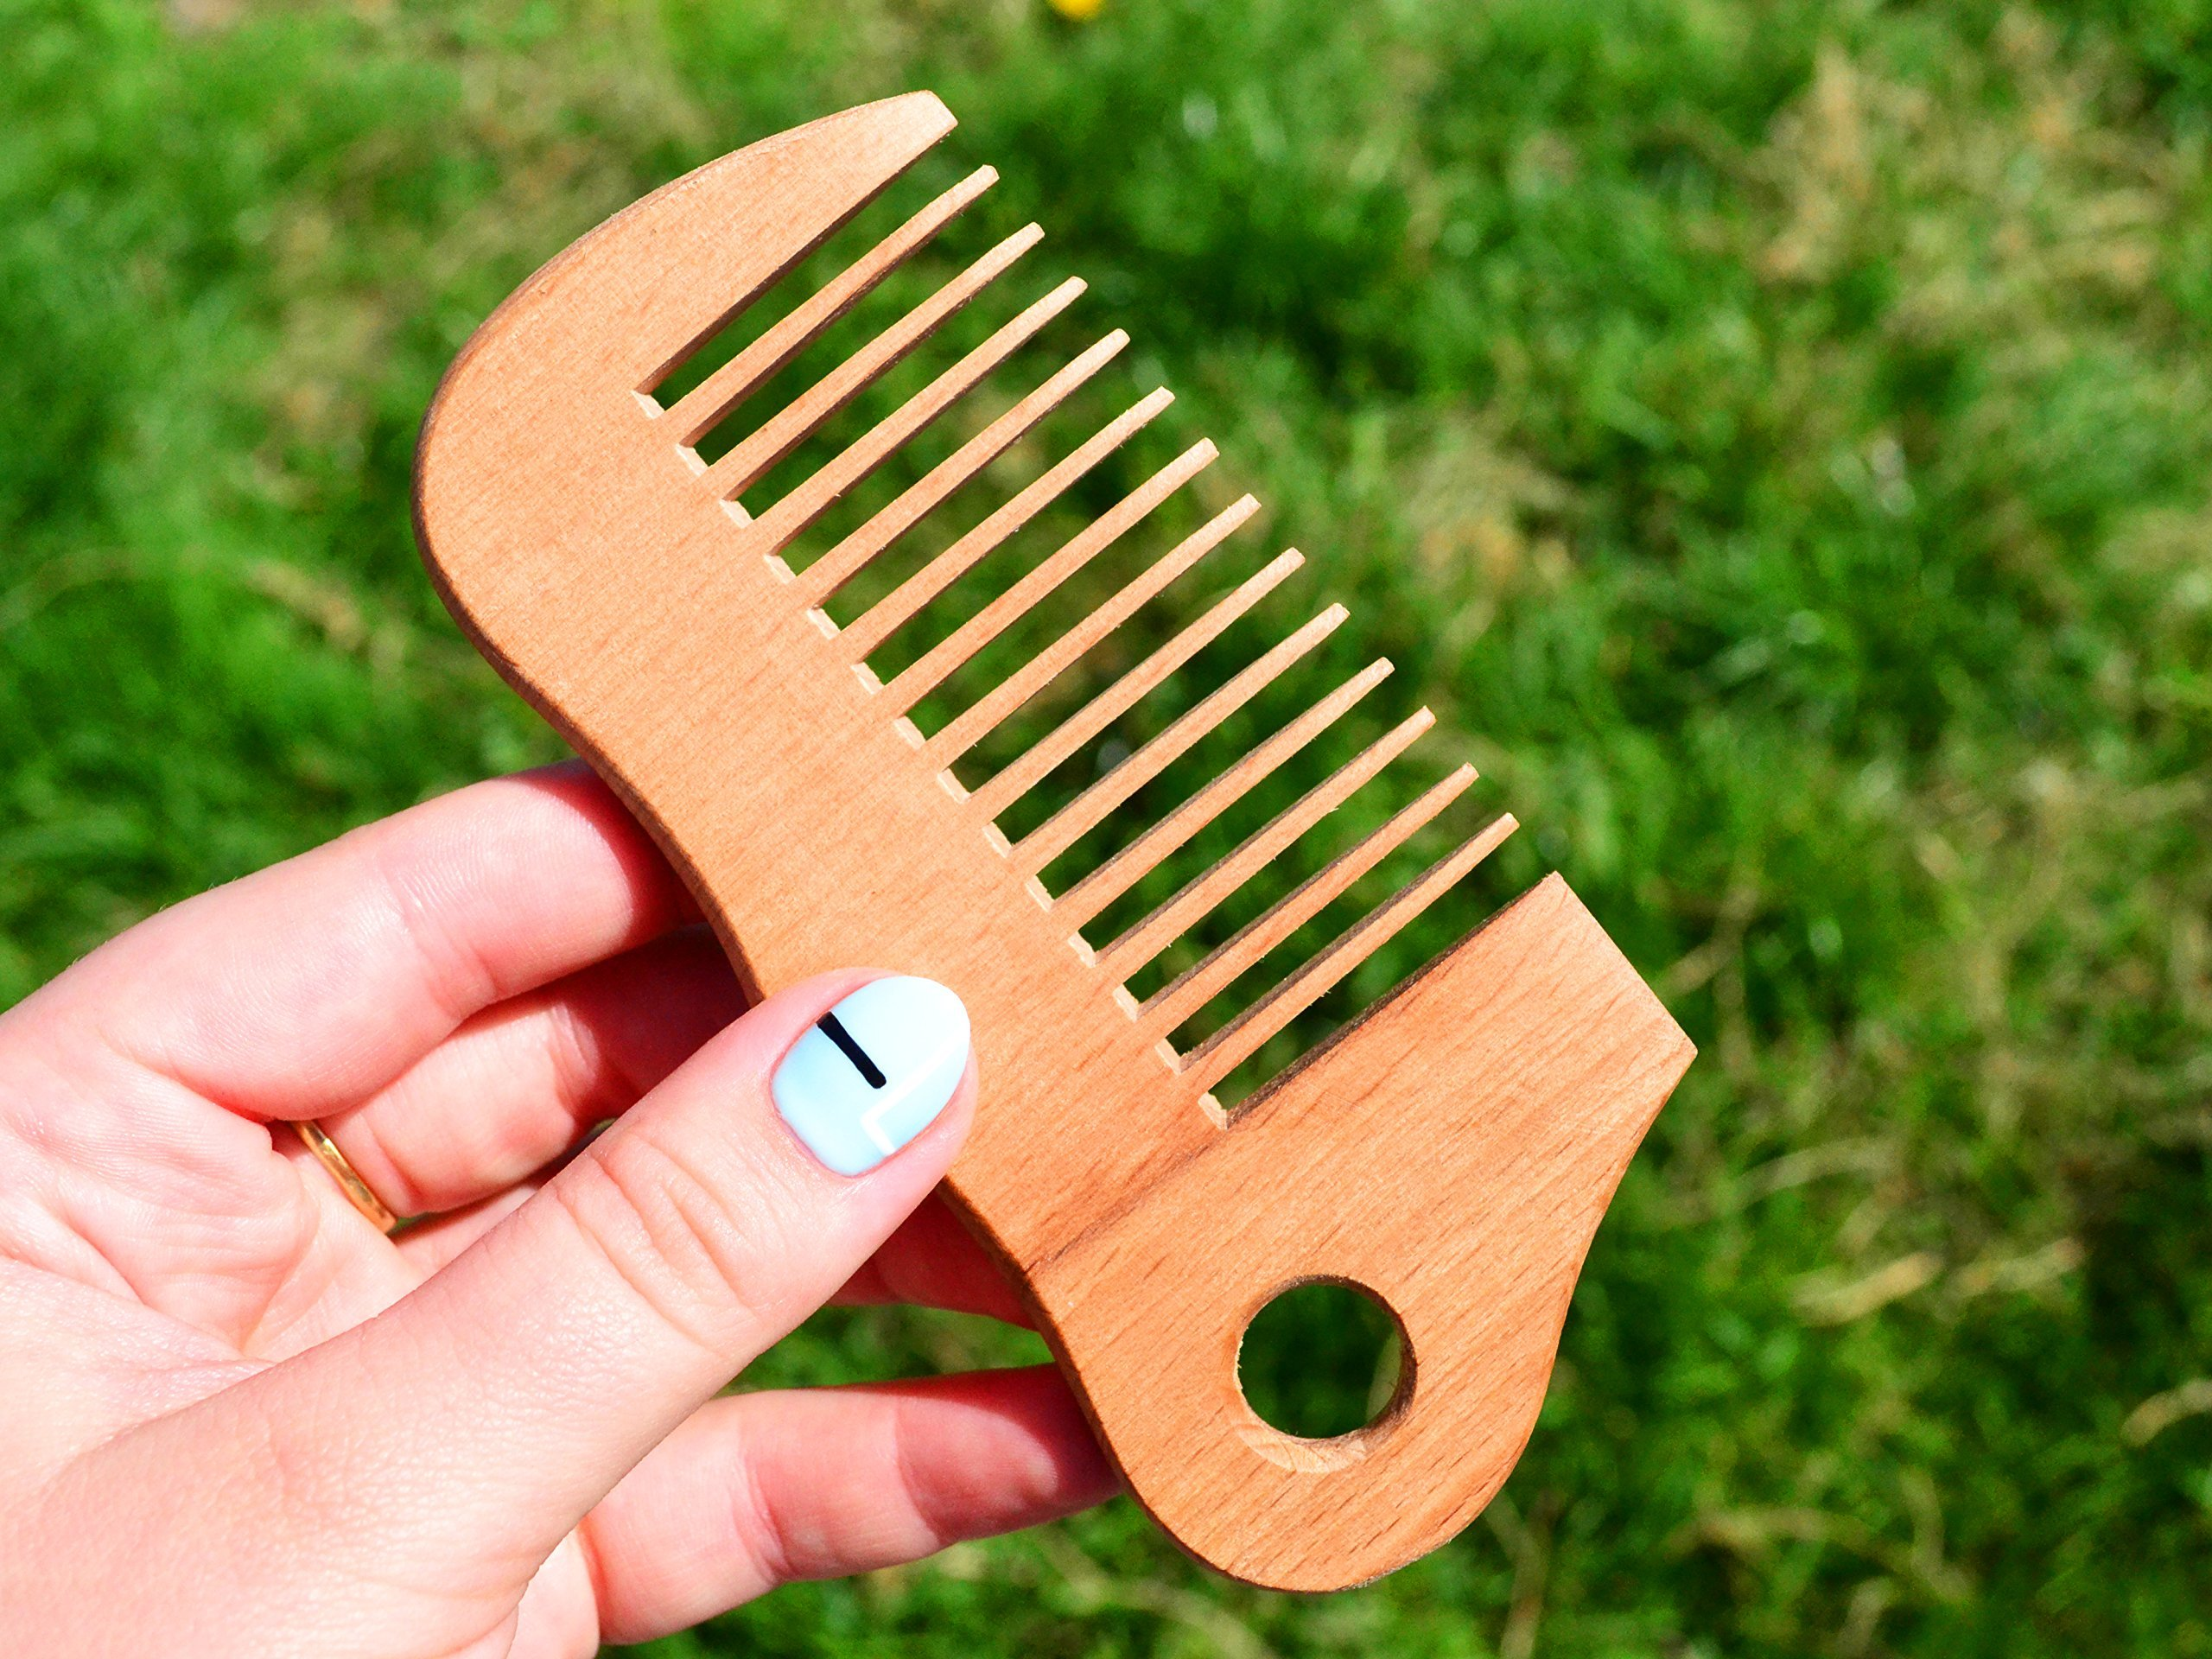 5'' Wooden Brush for Men - Groomsman Gift - Pocket Size Comb - Hairbrush - WoodenWorldUA - Wooden Comb - Wood Hair Brush - Handmade Comb - Pocket Wooden Bomb - Hair Care Comb - Wave Shape Beard Comb